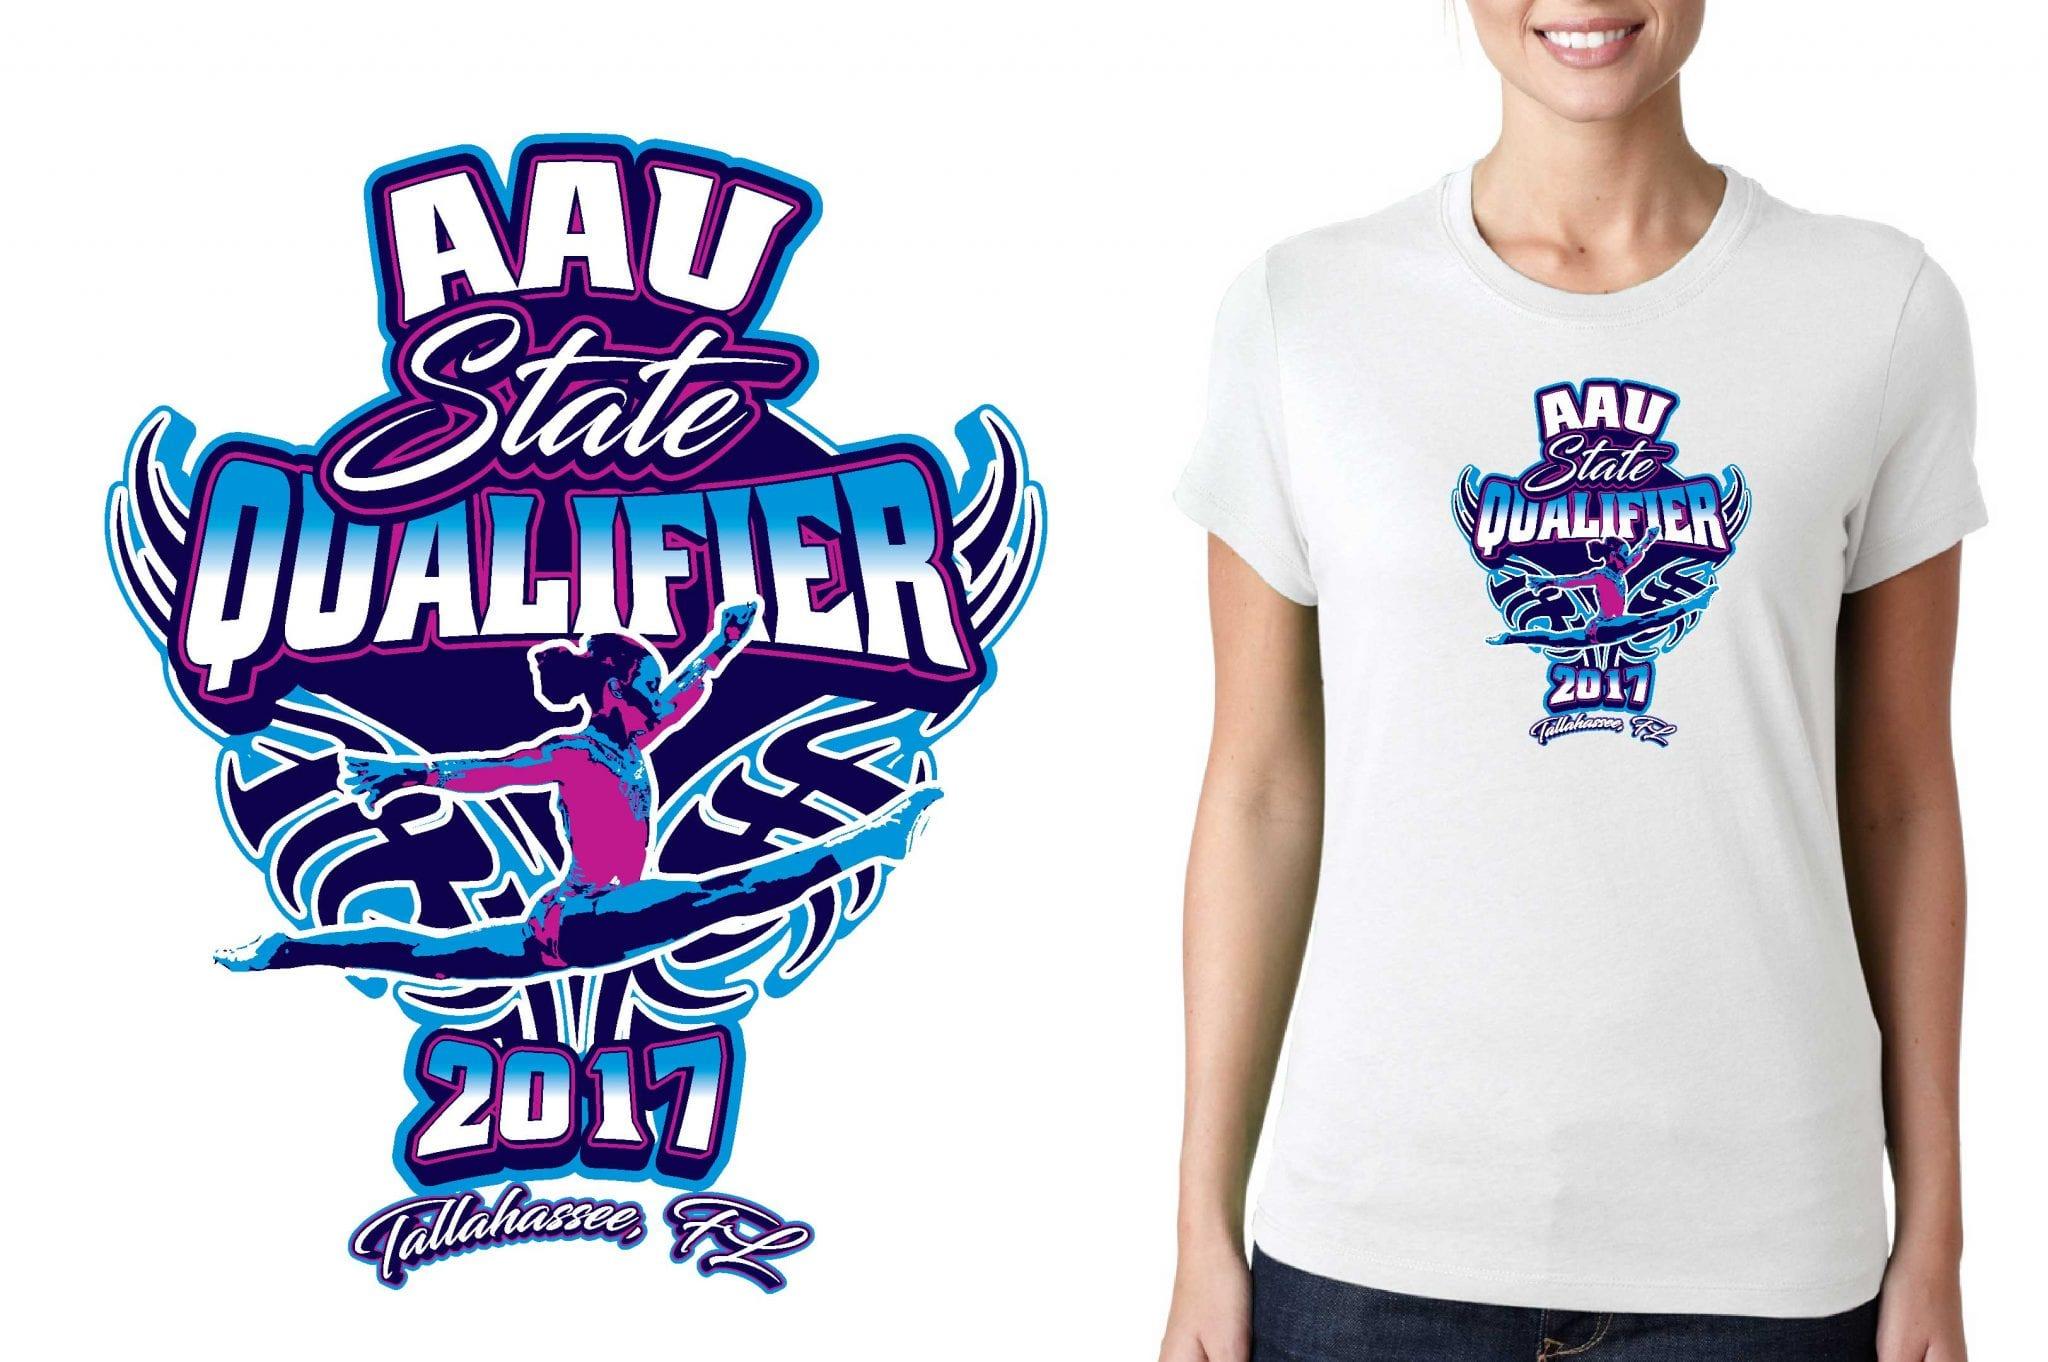 2017 1st AAU North Qualifier vector logo design for gymnastics t-shirt UrArtStudio